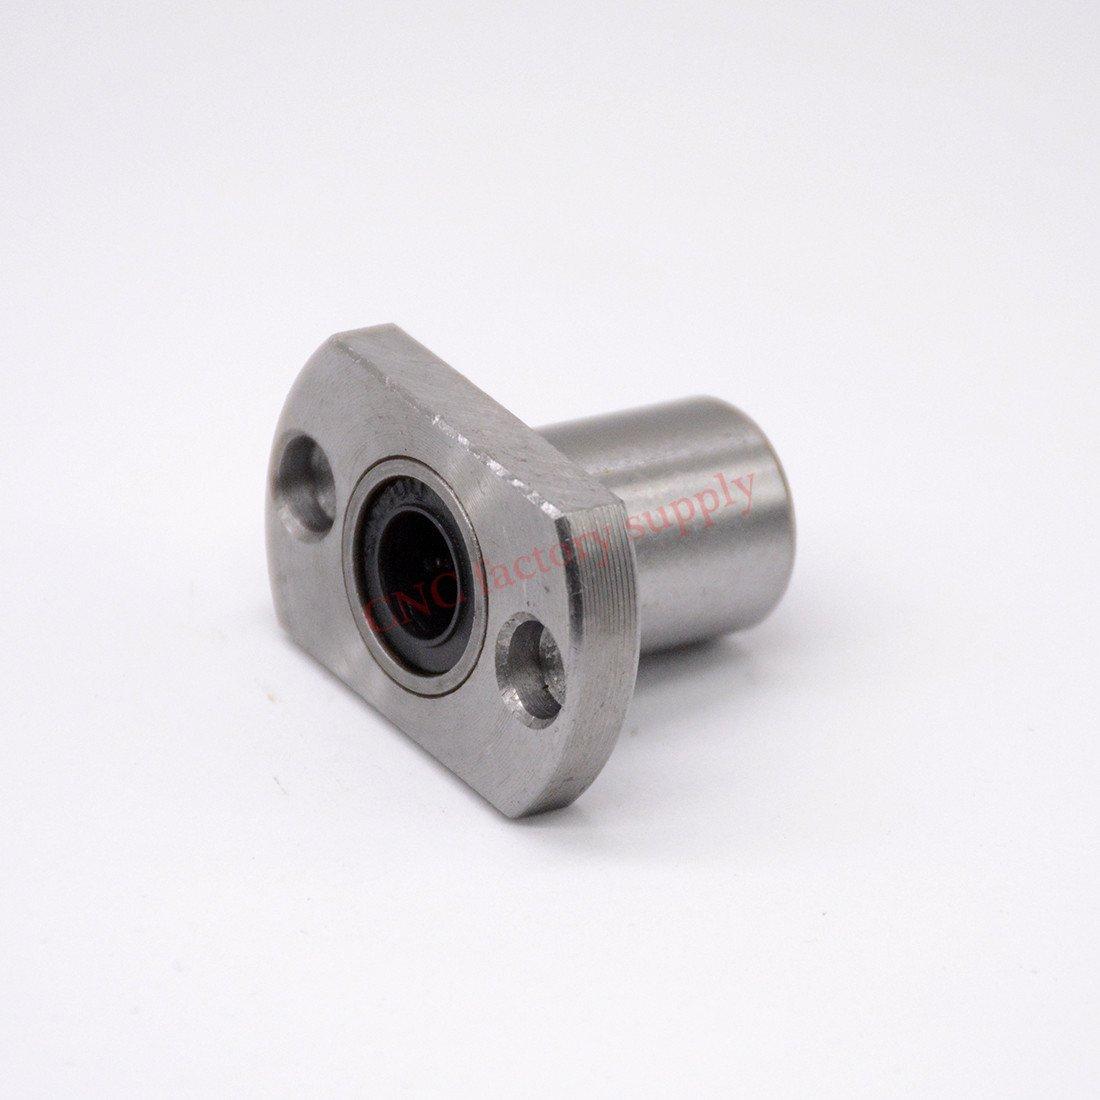 2pcs LMH12UU flange linear bushing linear bearing CNC part